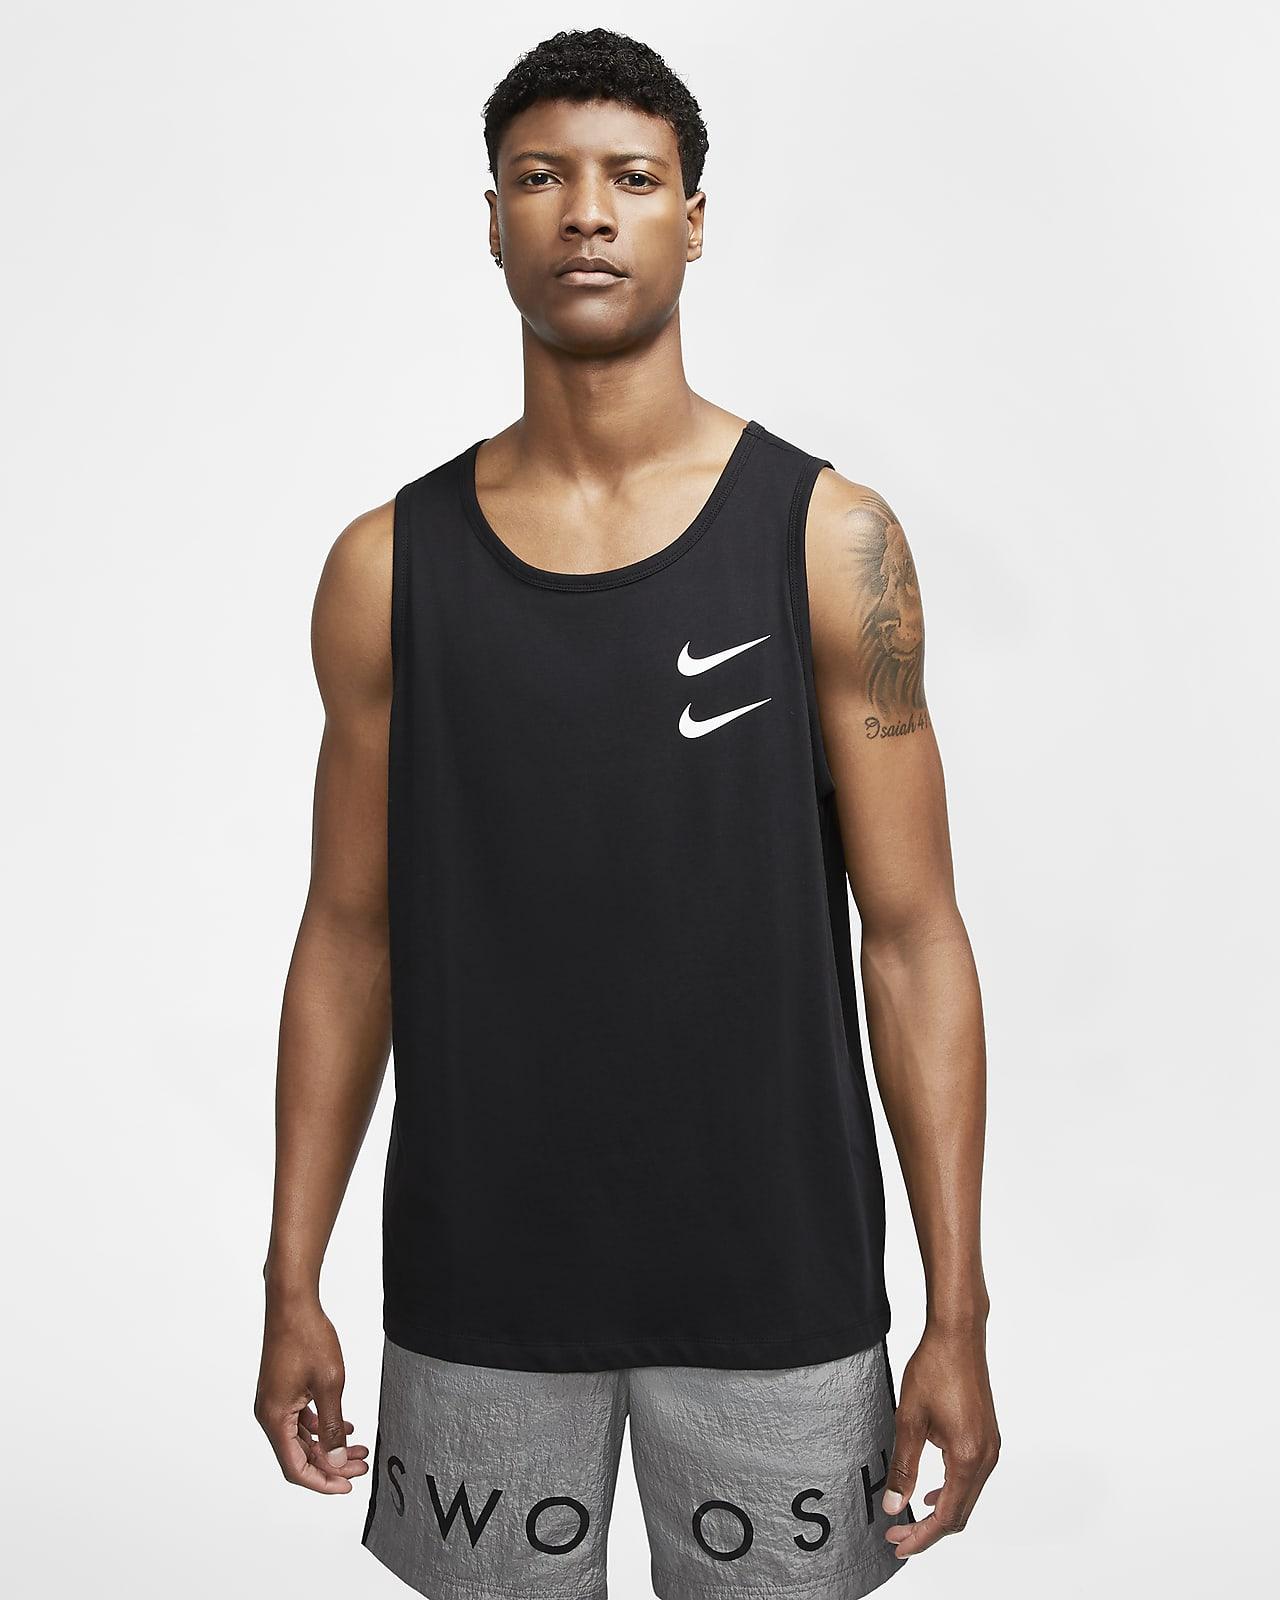 Nike Sportswear Swoosh Herren-Tanktop